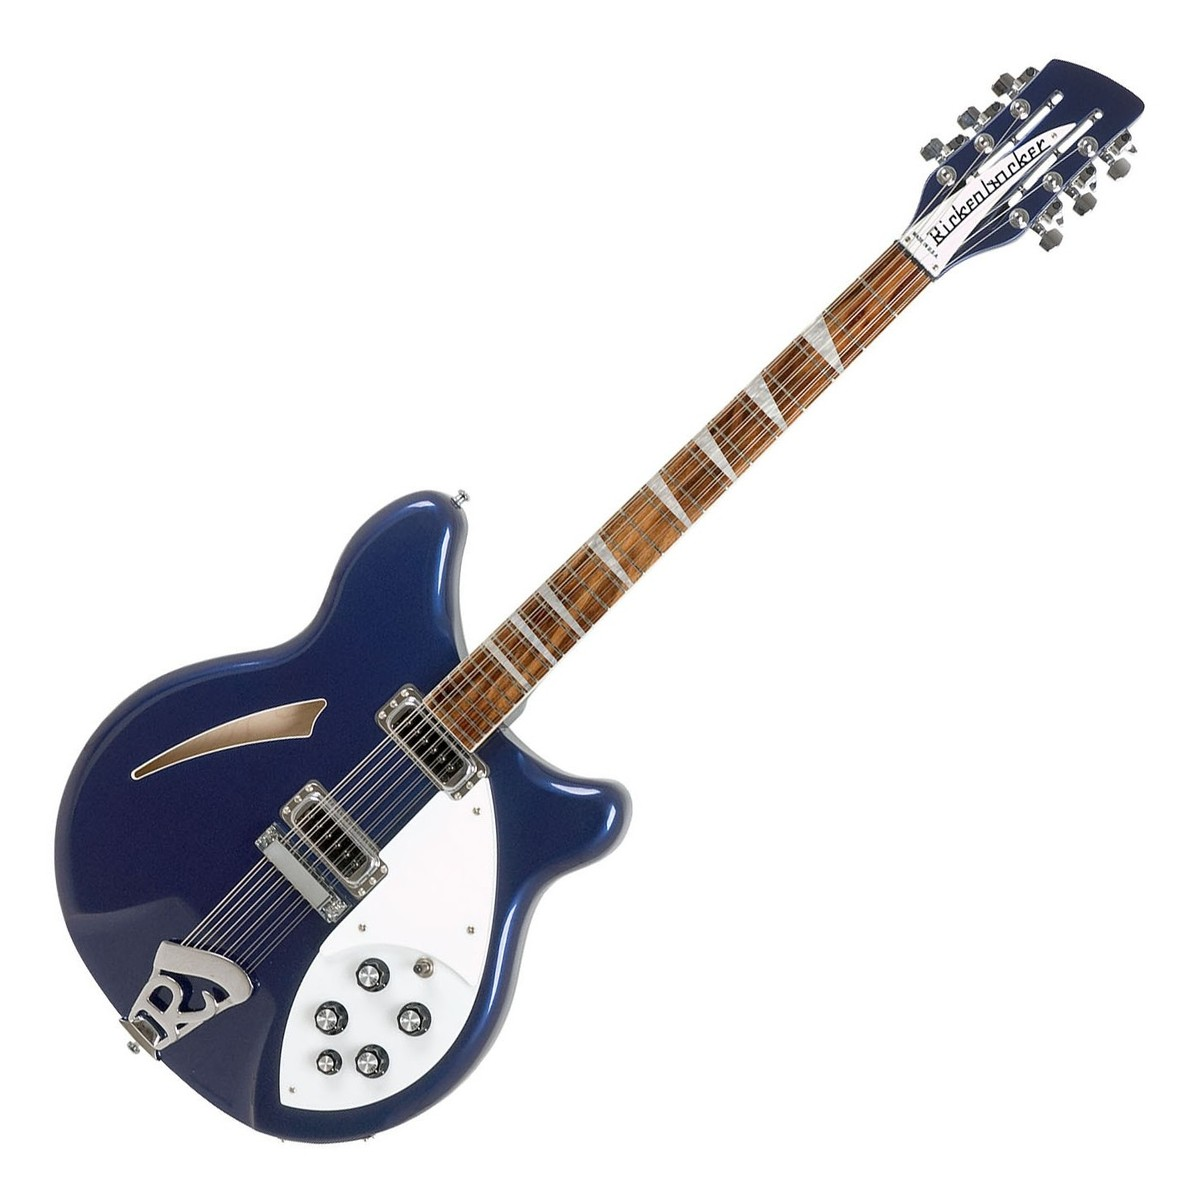 rickenbacker 360 12 string electric guitar midnight blue at. Black Bedroom Furniture Sets. Home Design Ideas